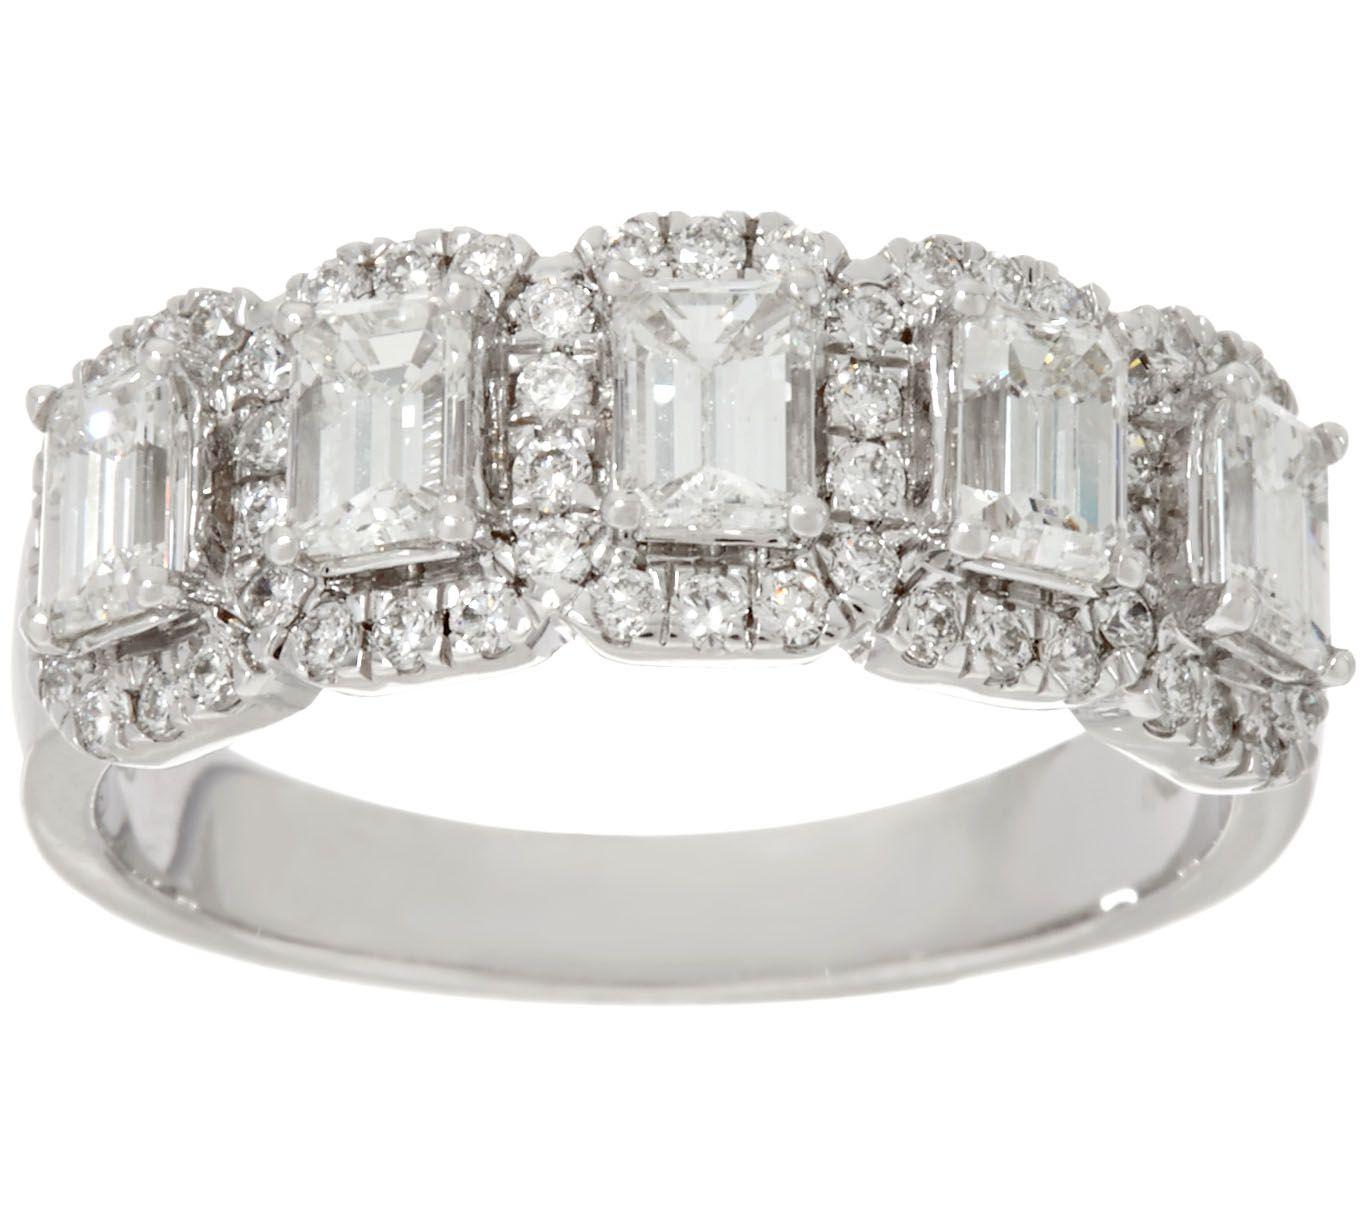 Halo 5 Stone Emerald Cut Diamond Band Ring 130cttw 14K Affinity